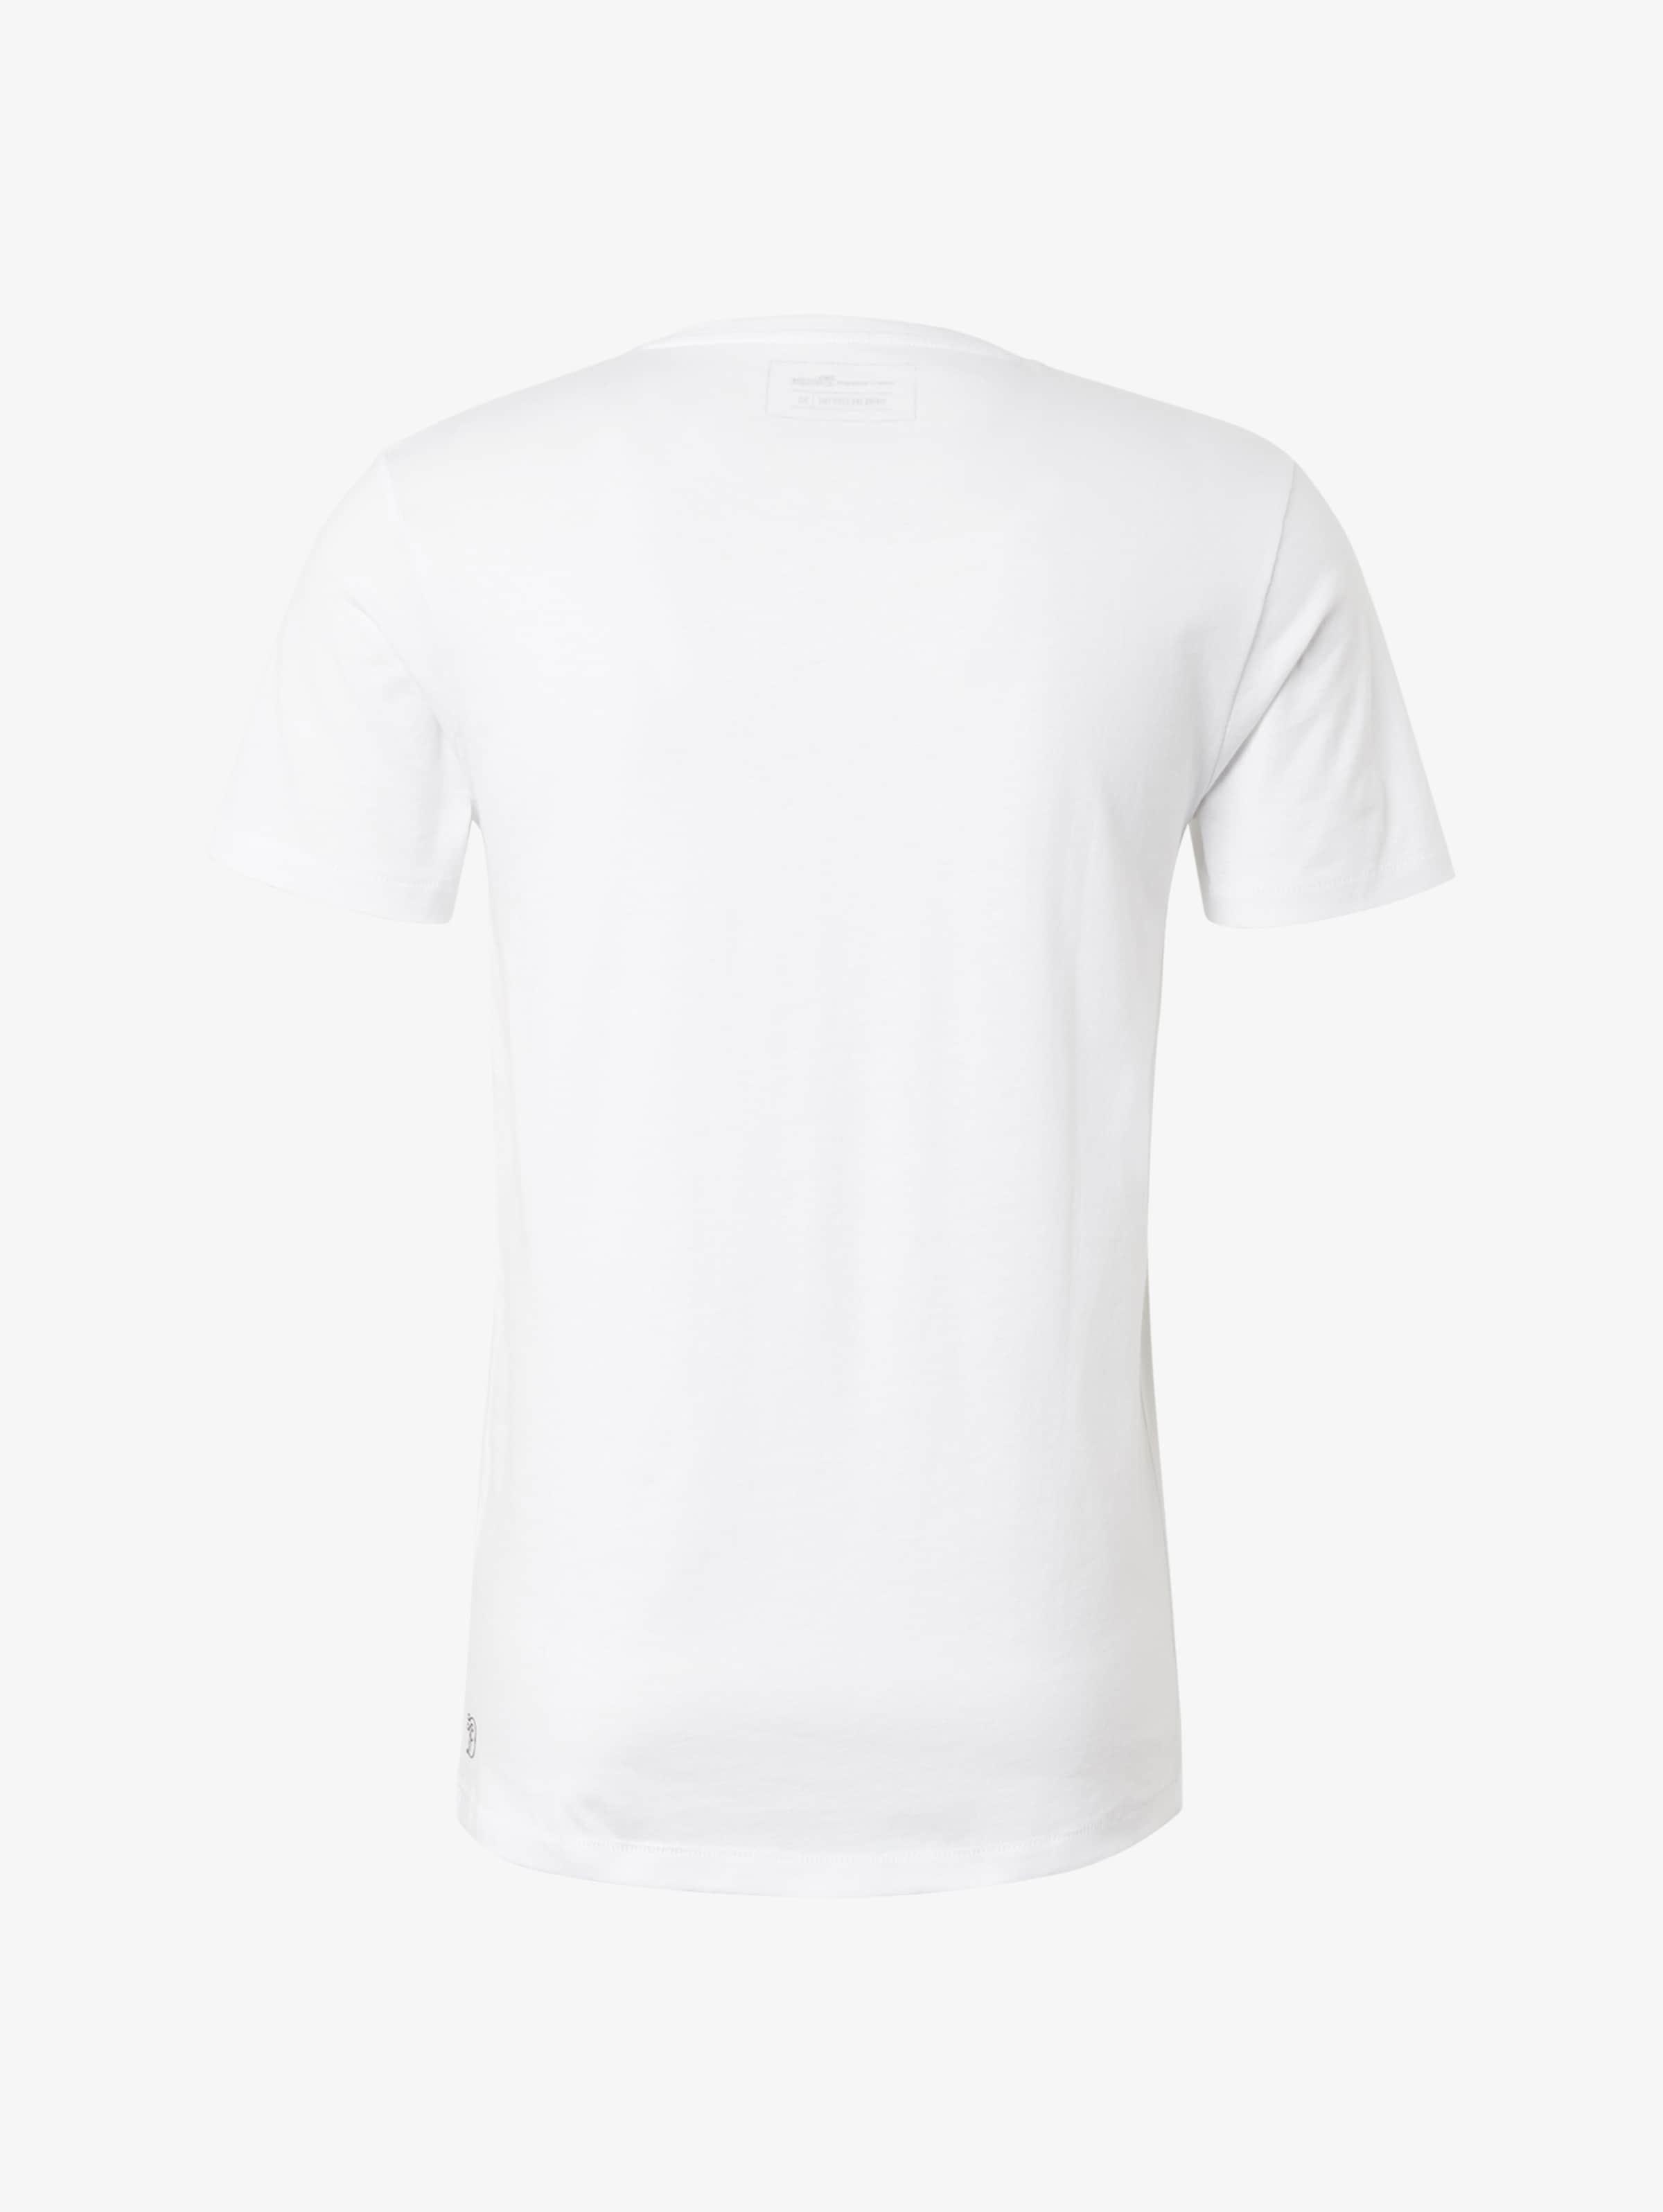 Tom Tailor Denim En T shirt Blanc rxoedBCQW